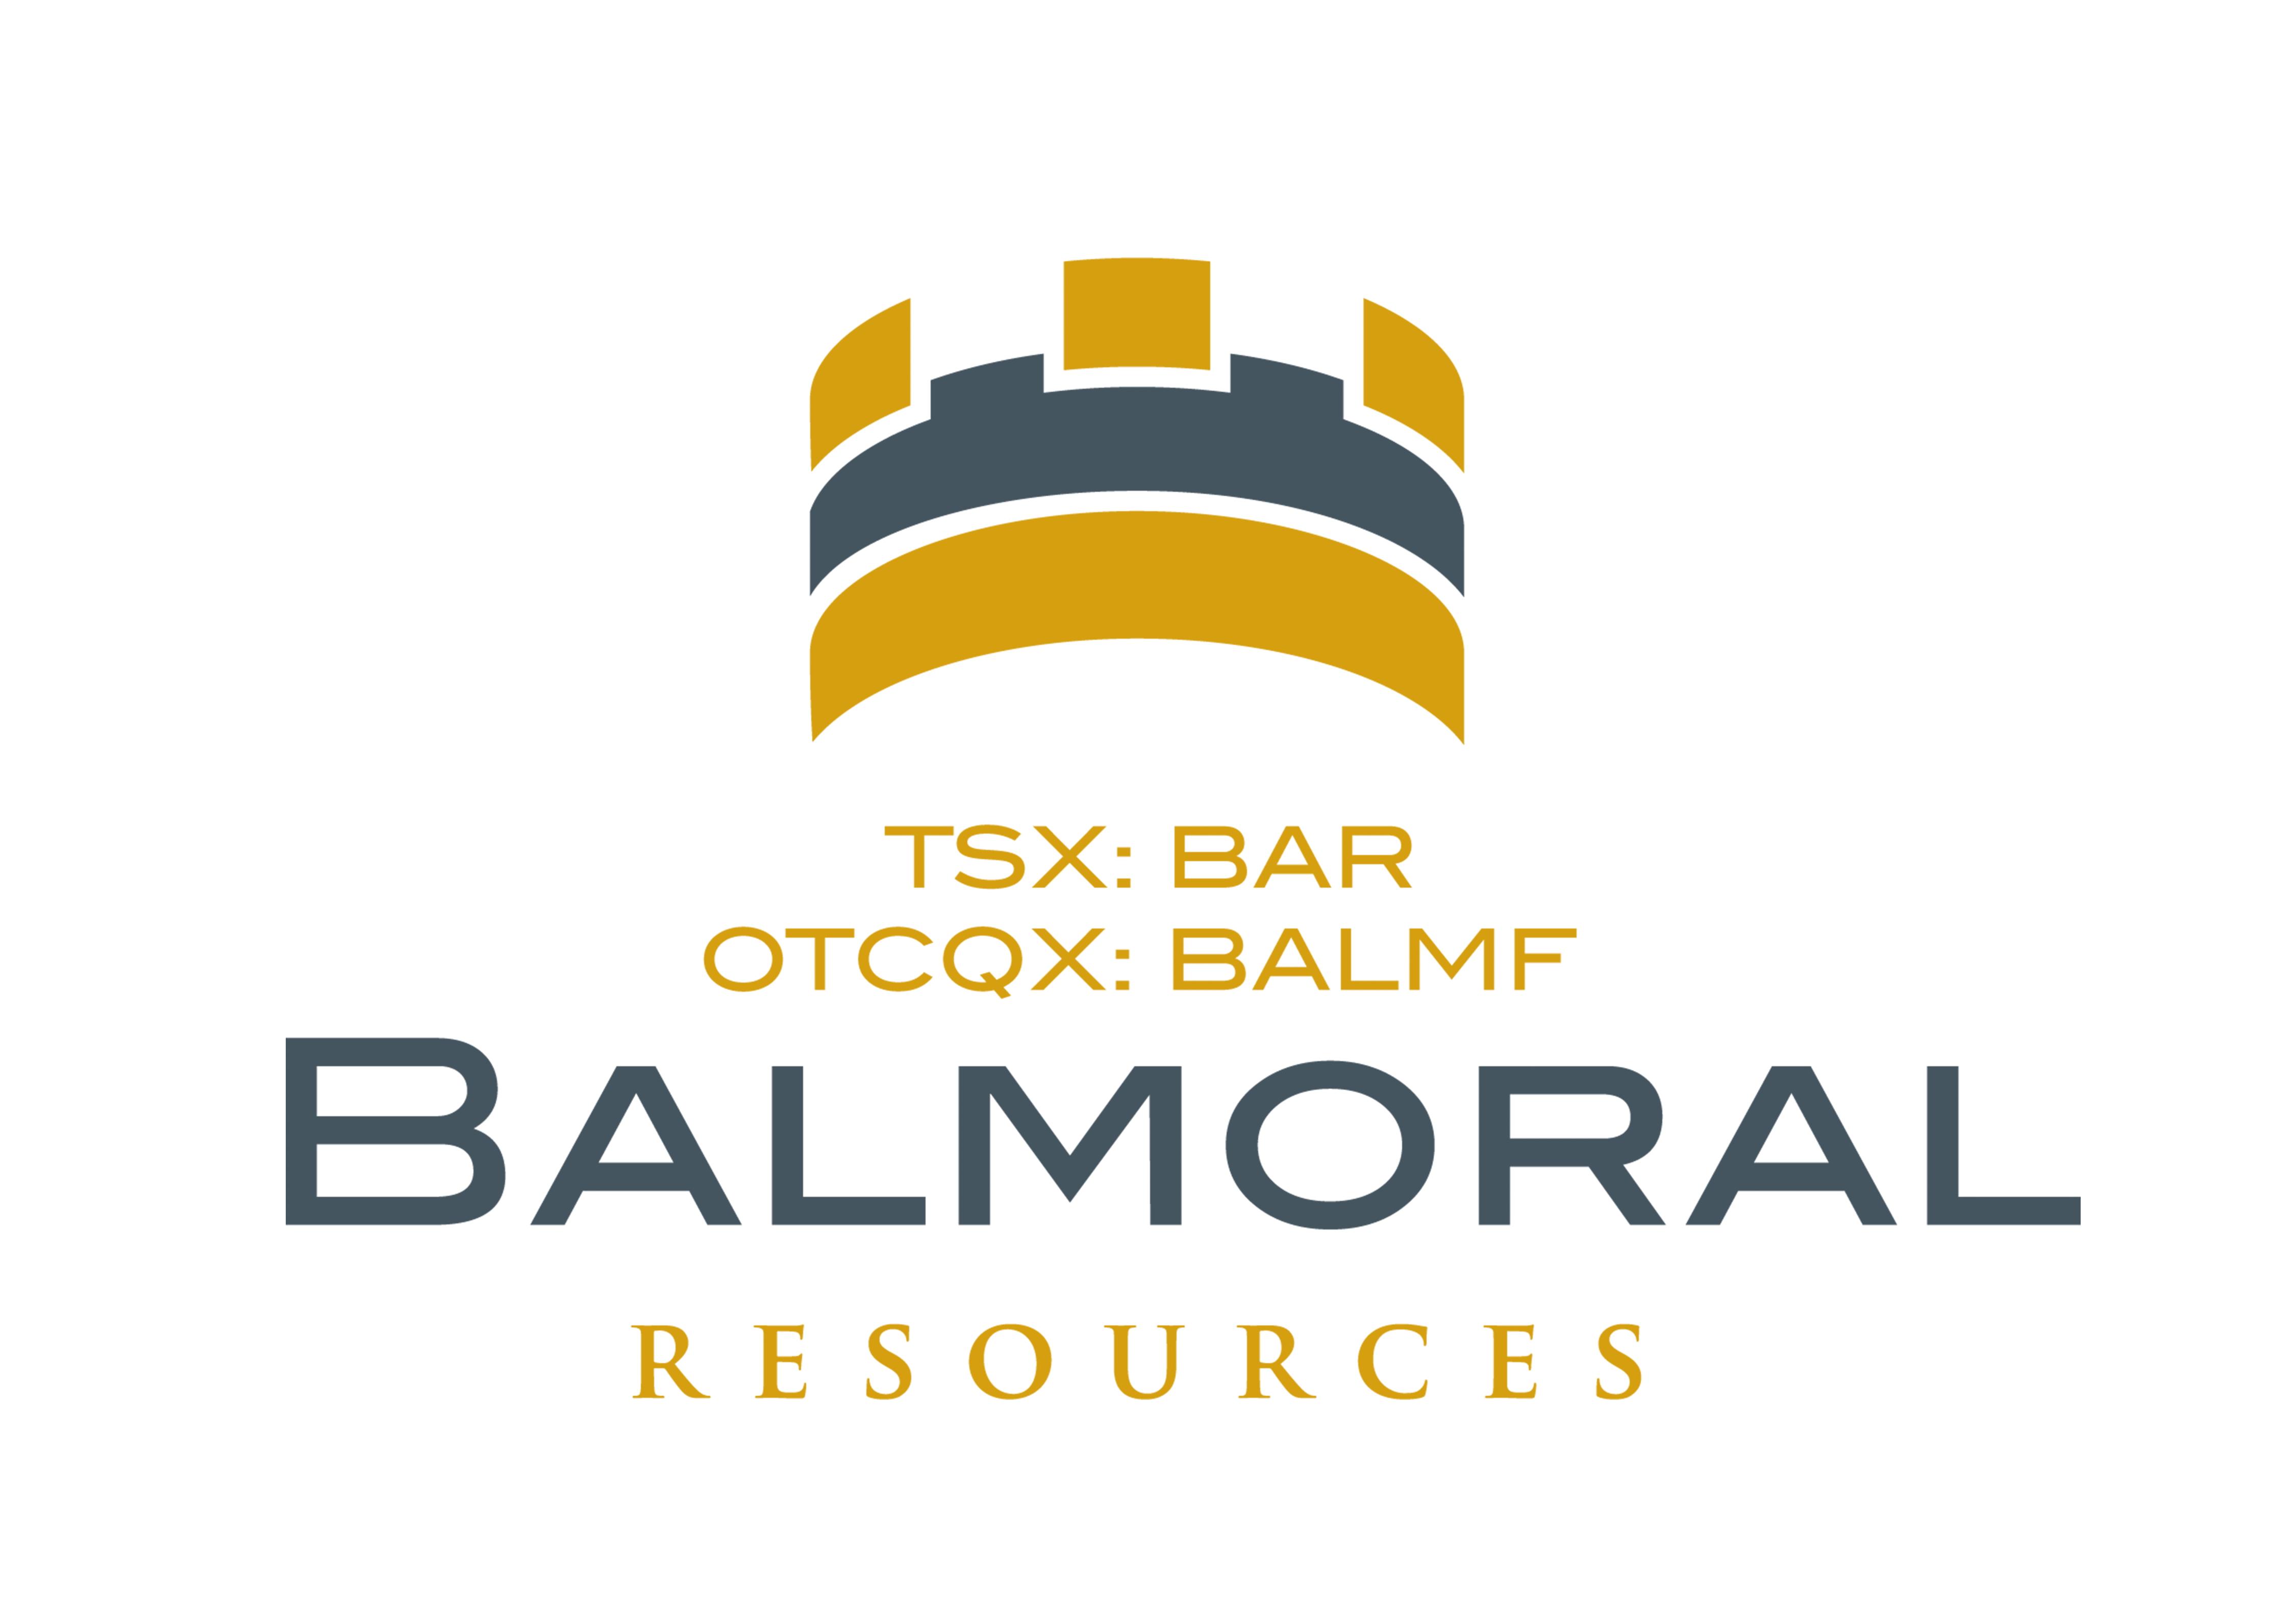 Wallbridge Mining Company Limited and Balmoral Resources Ltd